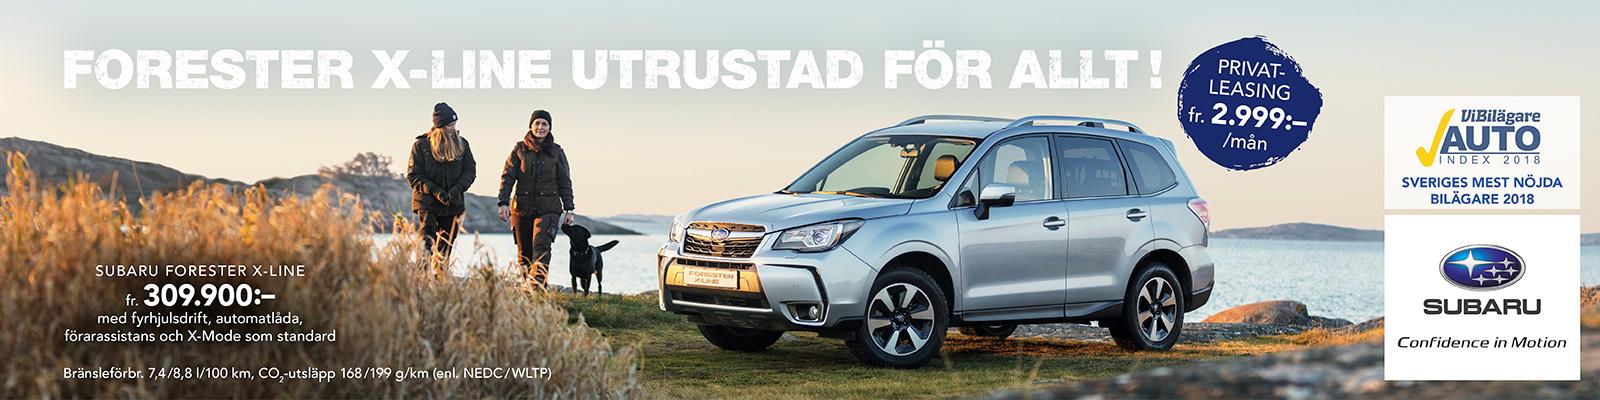 Subaru_ForesterX-Line_PL2999kr_1600x400